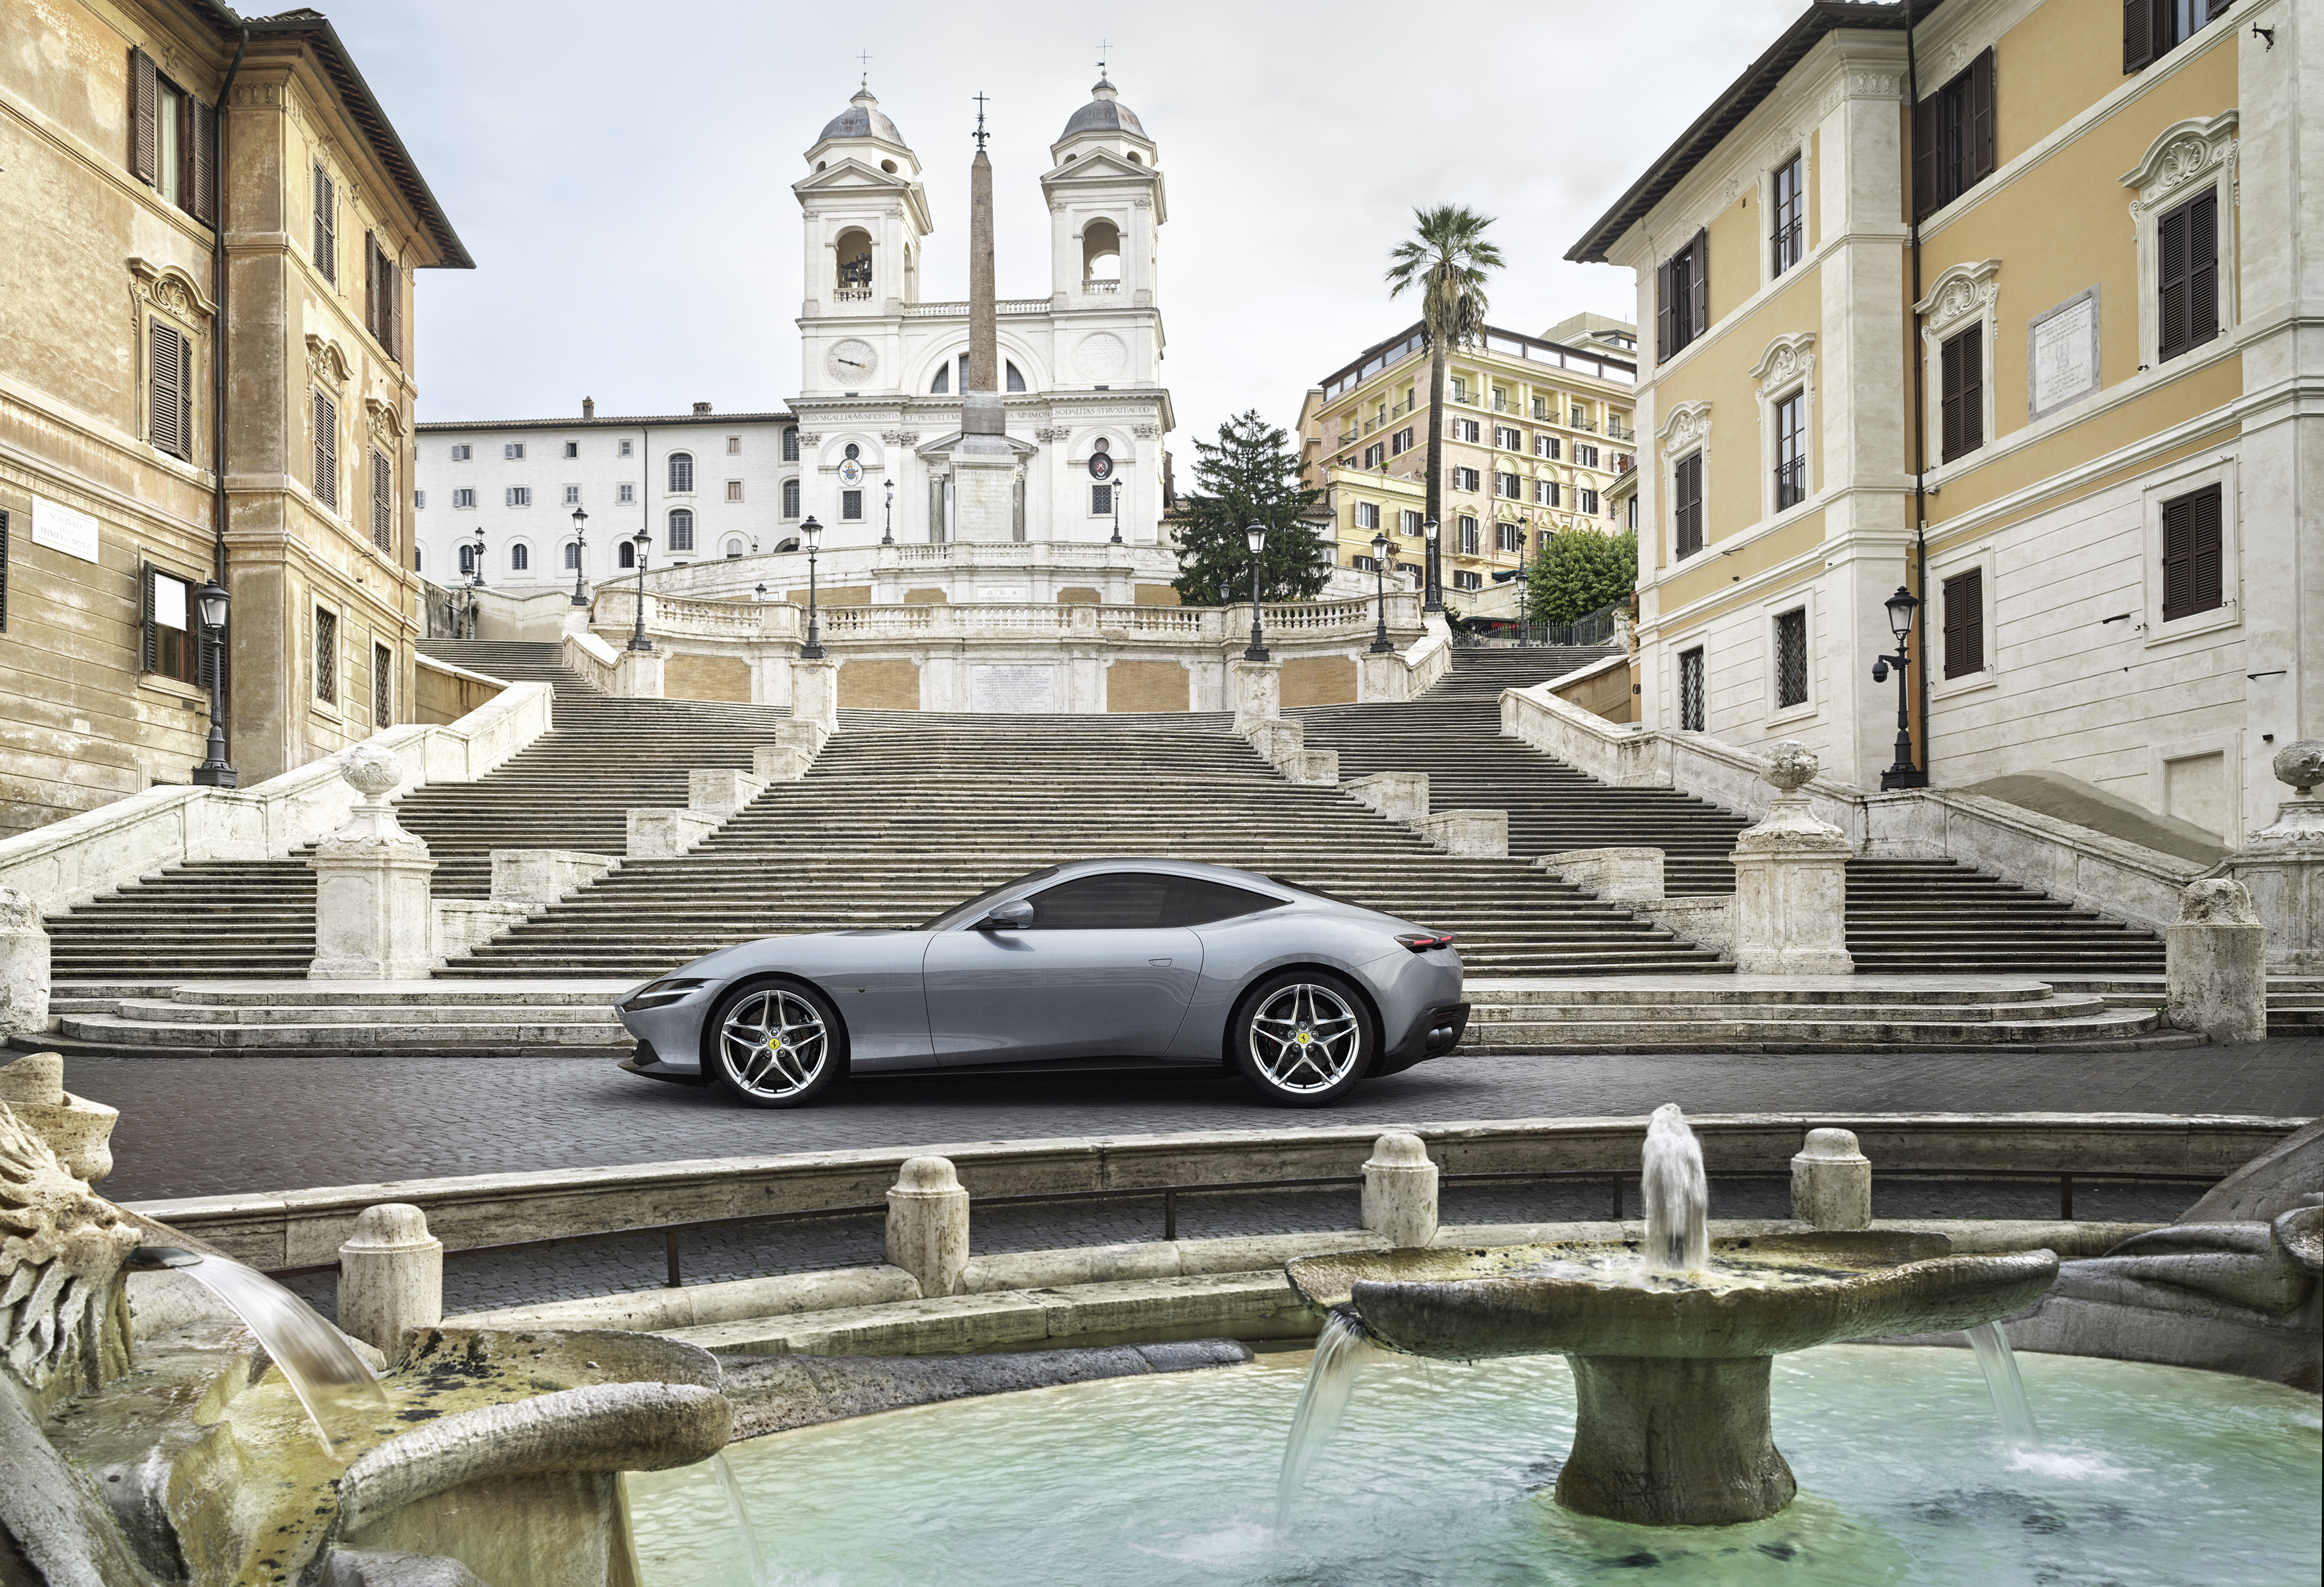 2020 ferrari roma 1577652480 - 2020 Ferrari Roma - 2020 Ferrari Roma 4k wallpaper